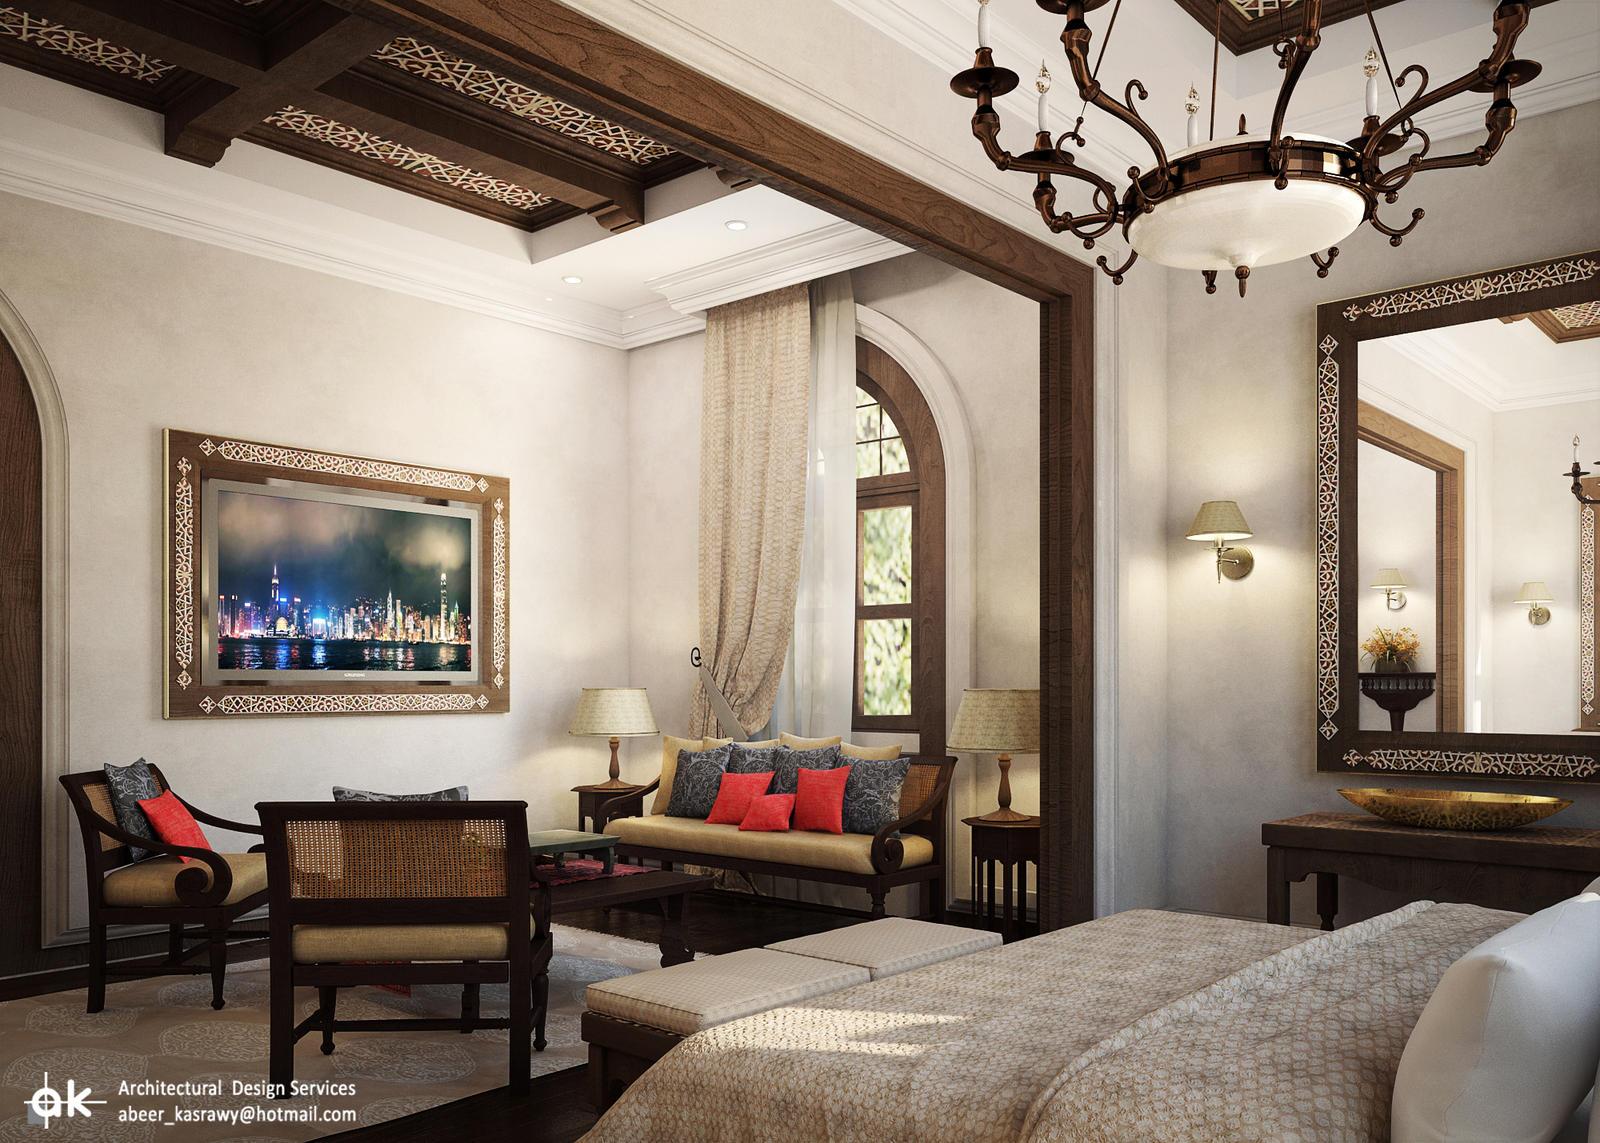 KSA Boutique hotel - Interior 1 by kasrawy